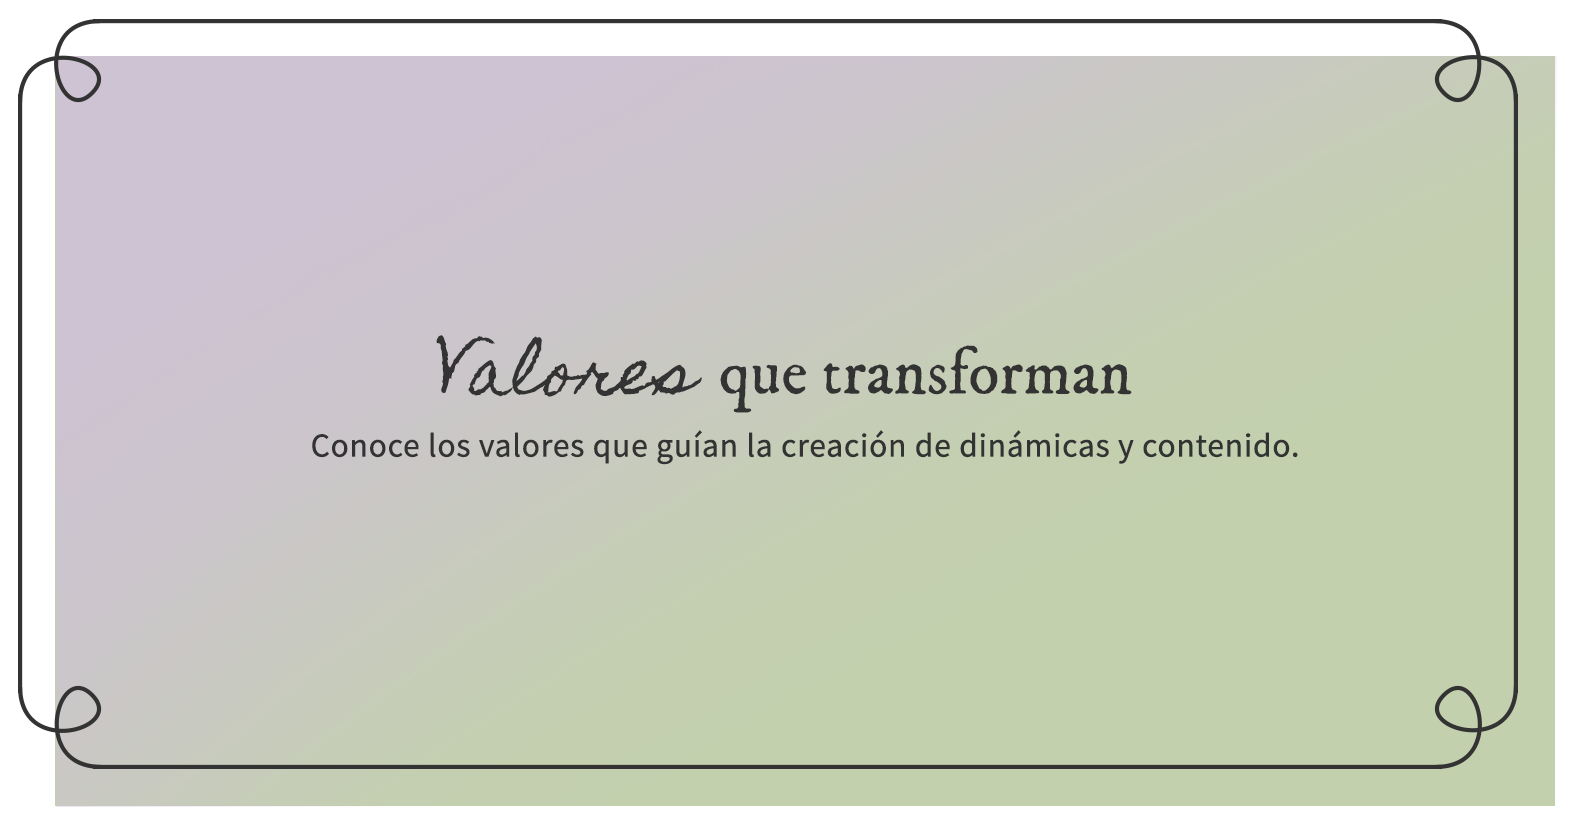 valores que transforman.png